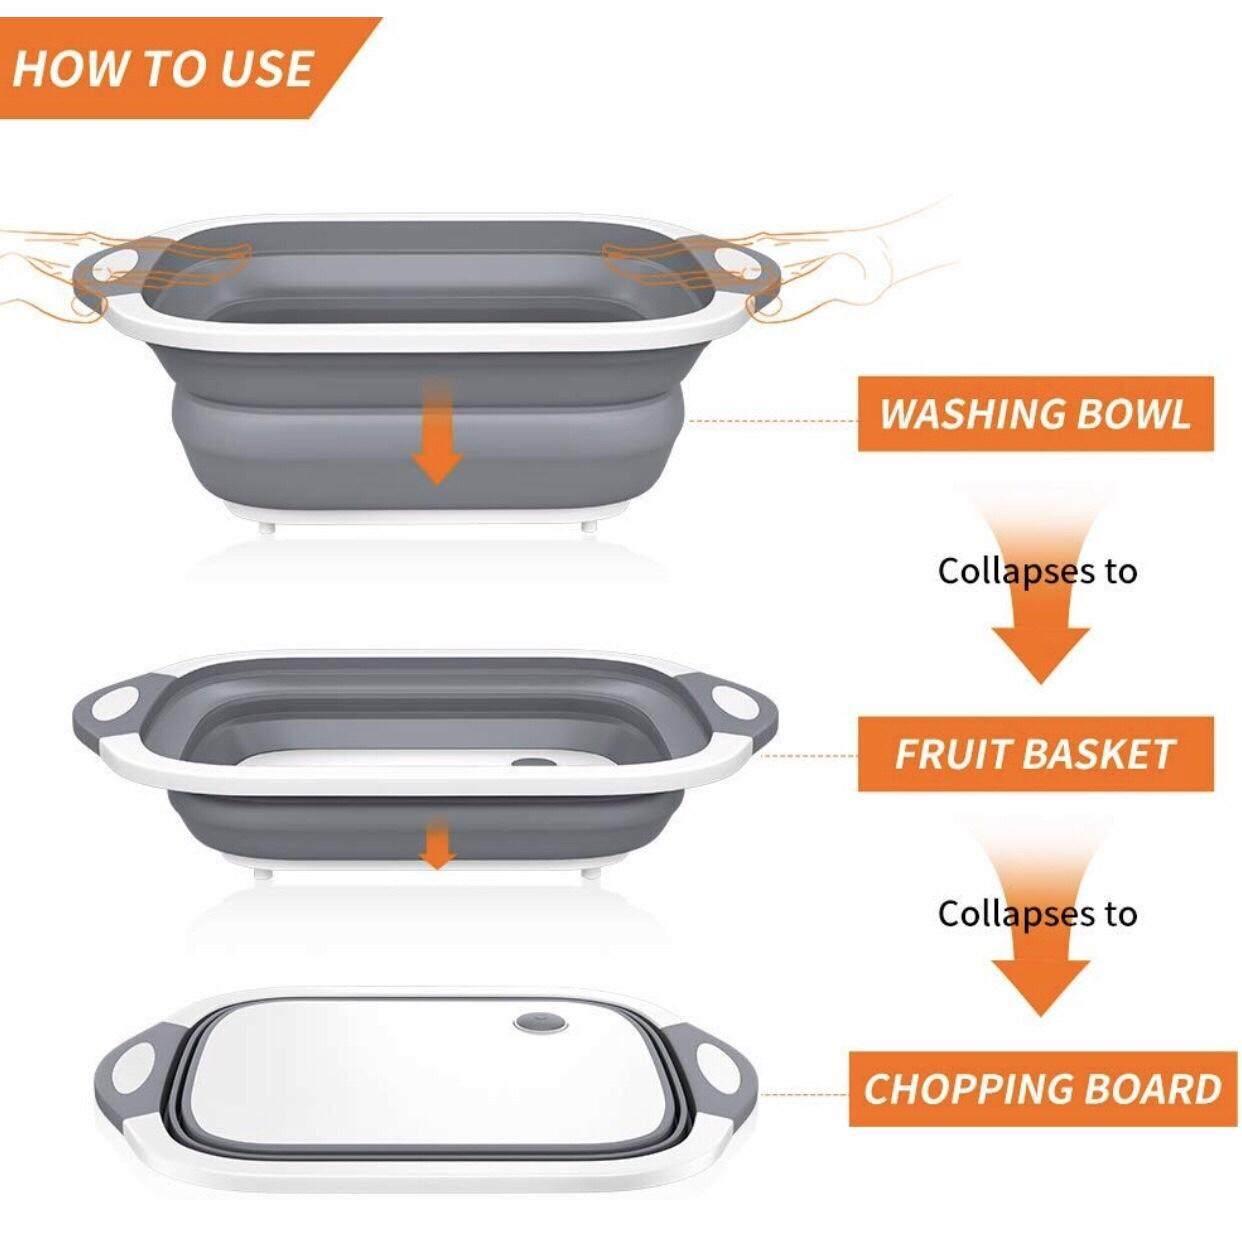 Image 5 for Puket Store กะละมังพับได้ เขียงพับได้ กะละมังล้างผักผลไม้  เขียงซิลิโคนพับเก็บได้  กะละมังซิลิโคนพับเก็บได้